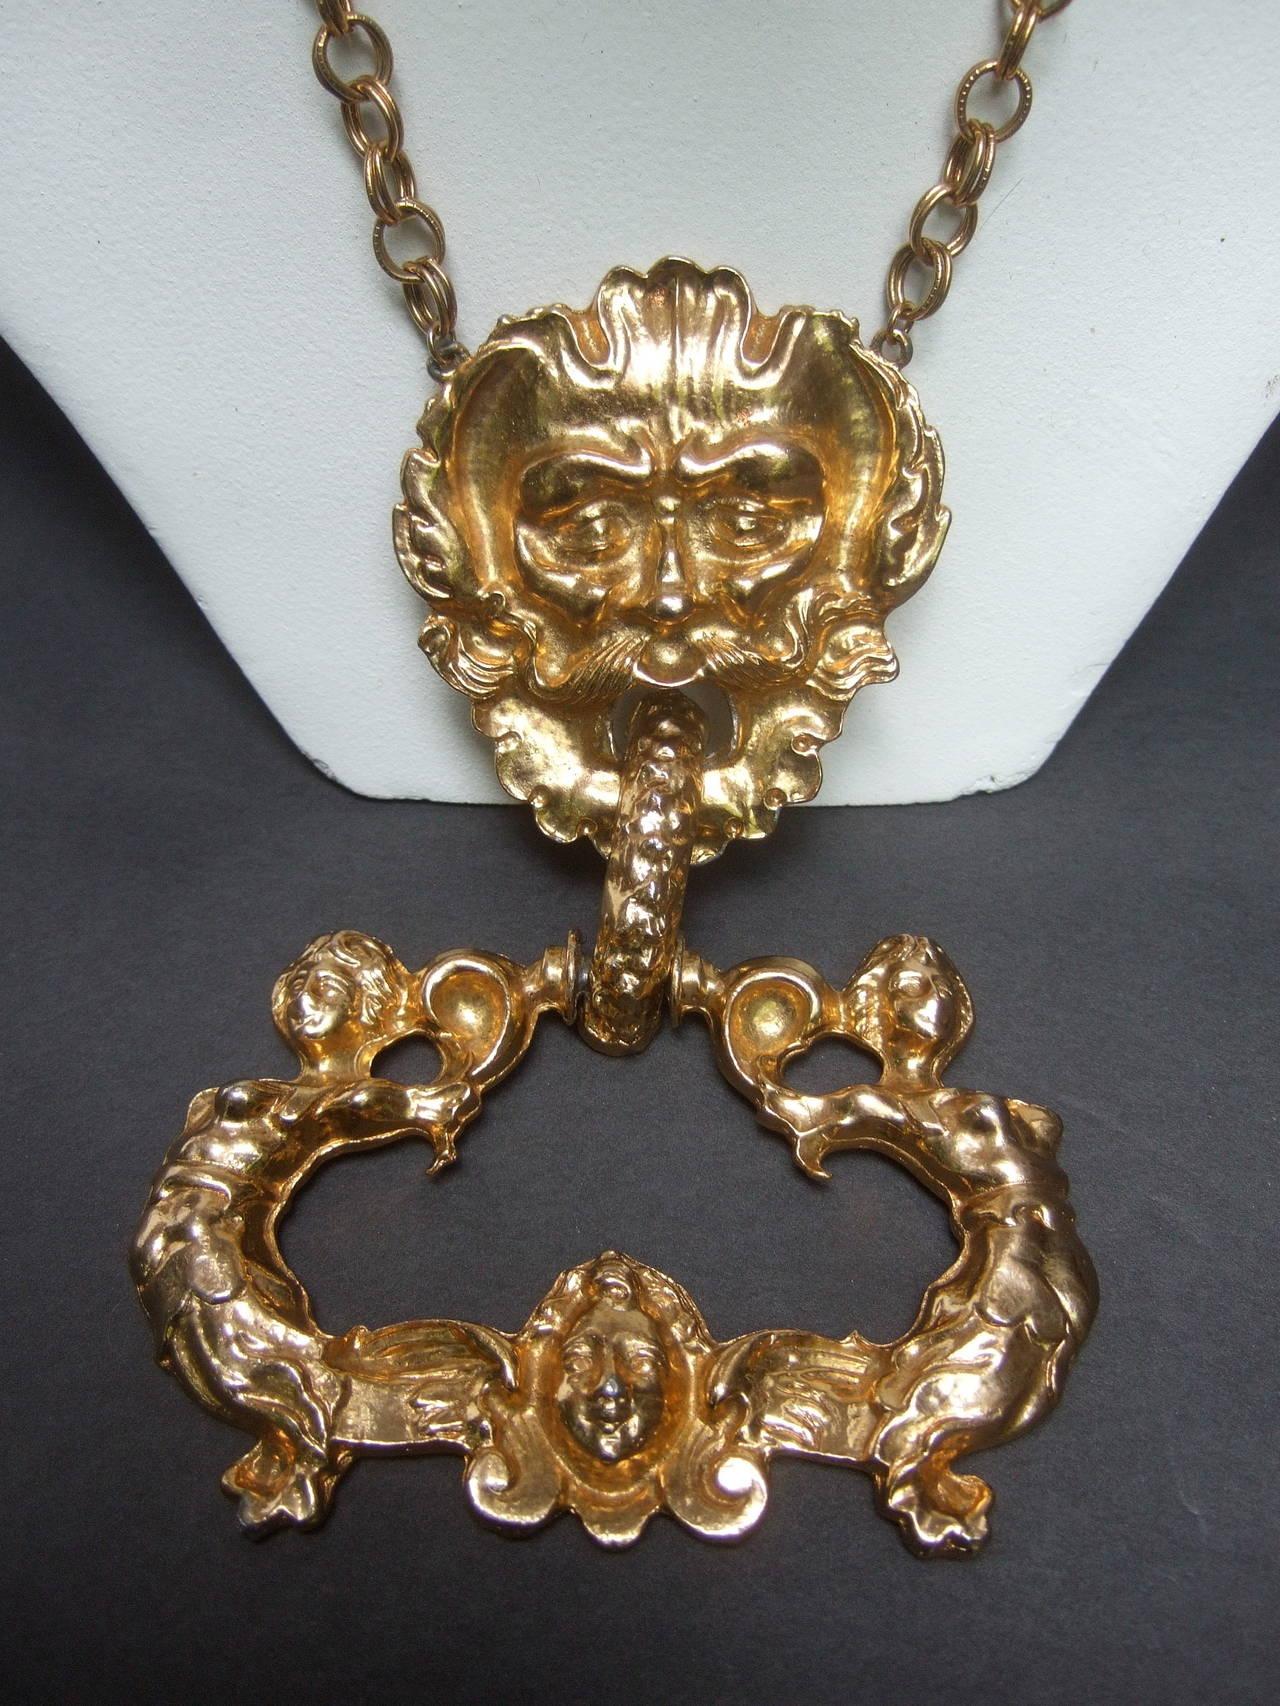 Massive Gilt Metal Figural Pendant Necklace c 1970 For Sale 6